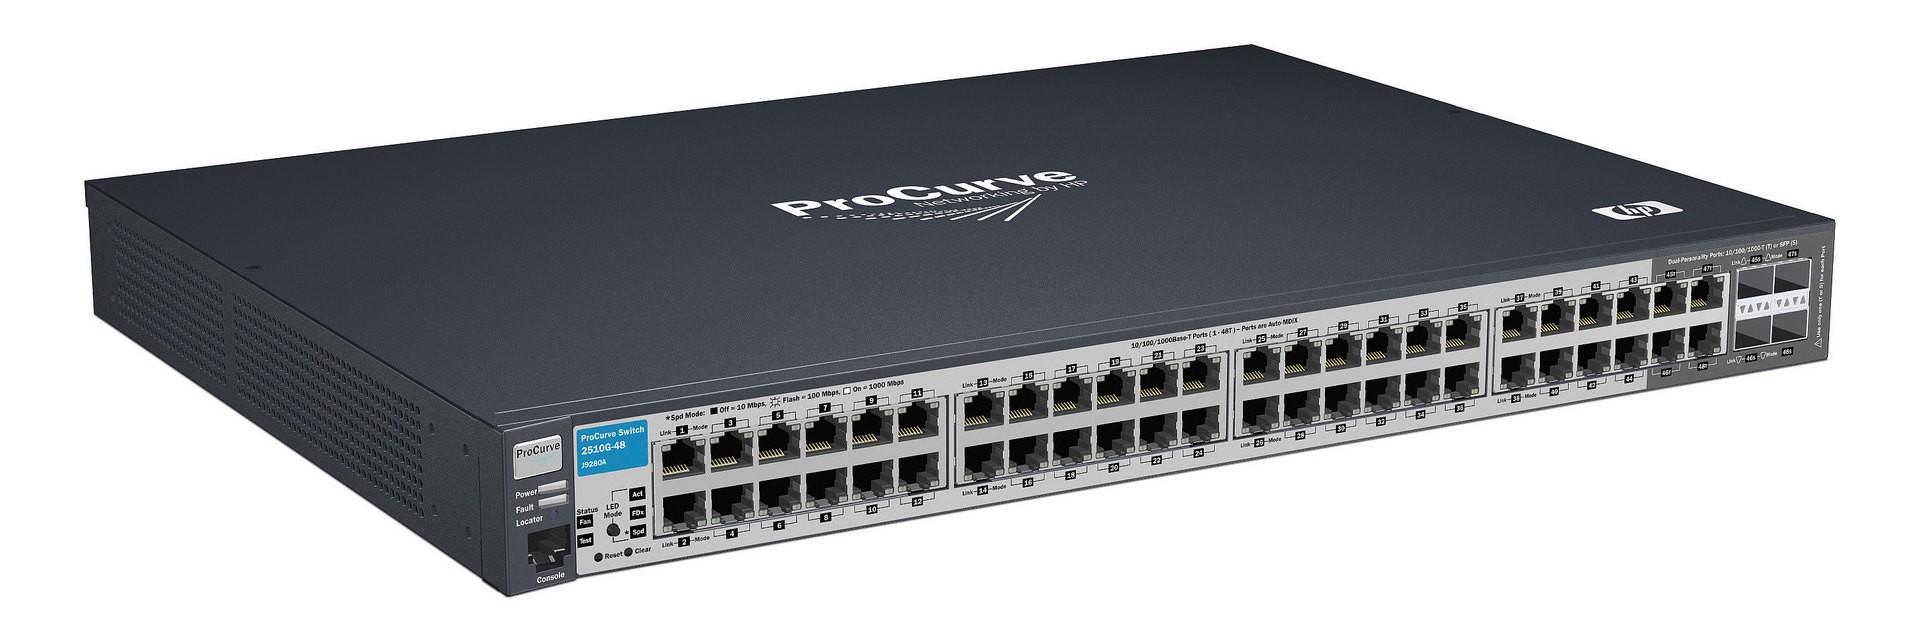 HP J9280A ProCurve 48 Port 2510 Series Switch - TechQube com